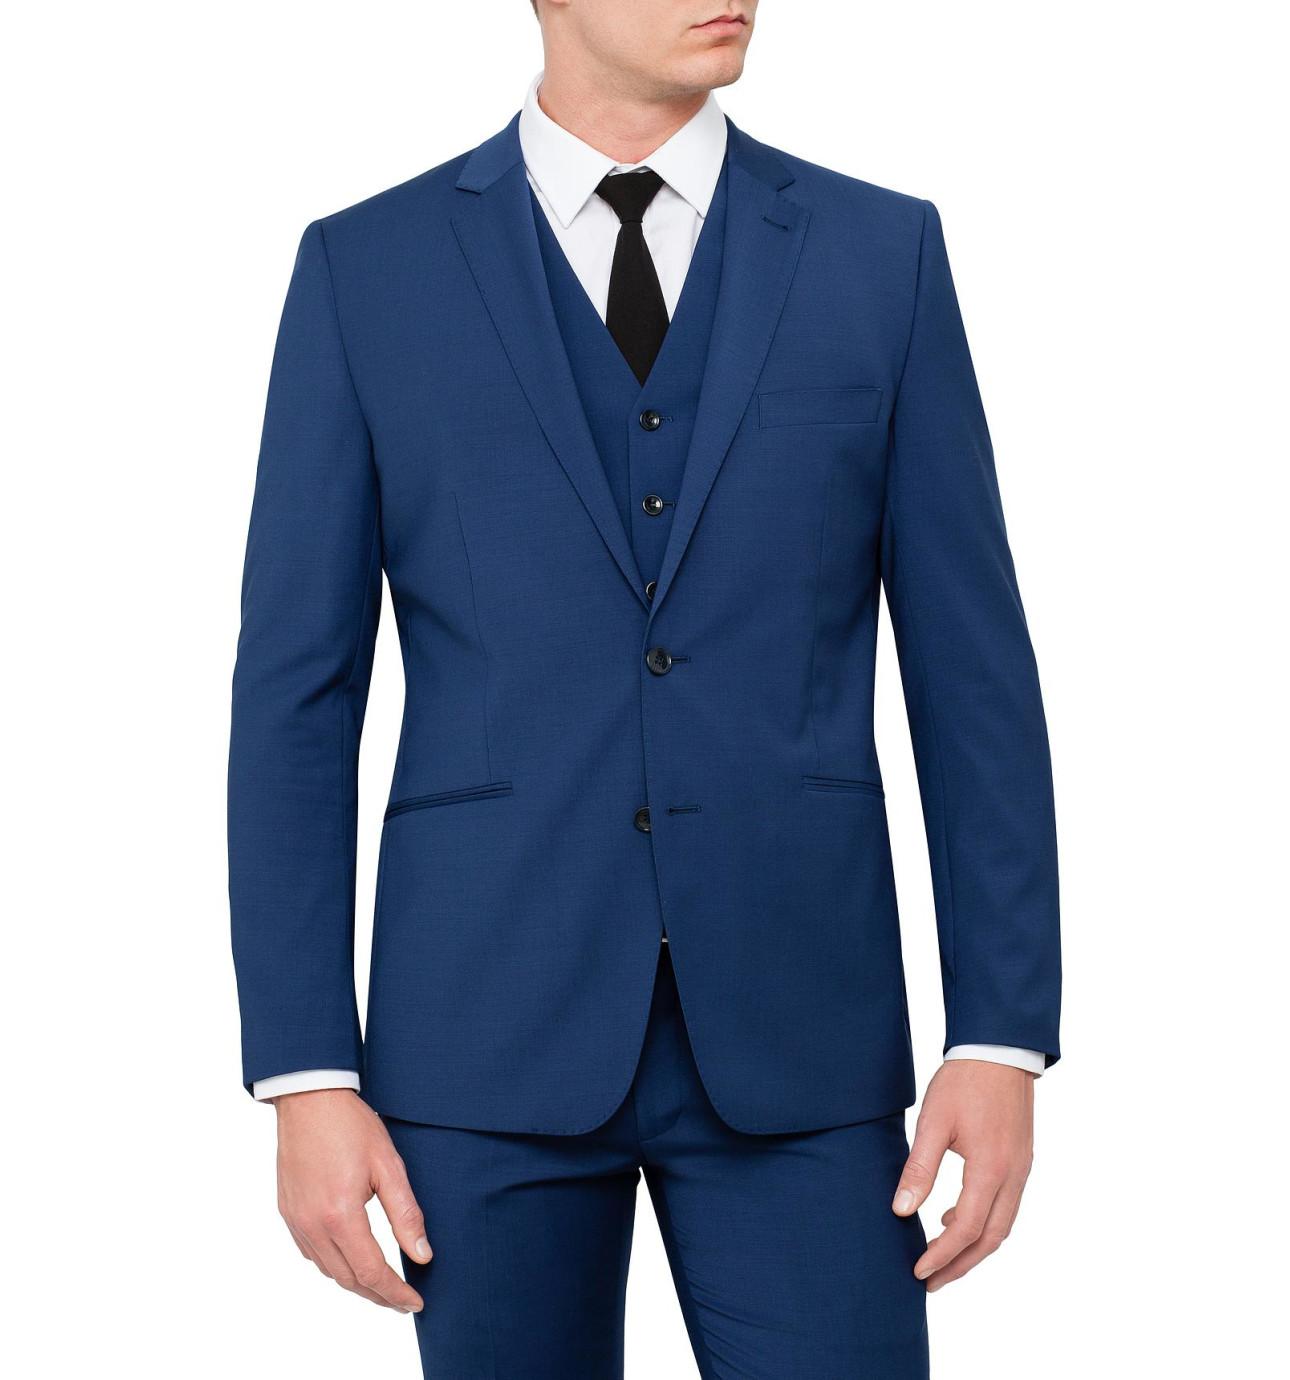 Mens jacket david jones - Jack Suit Jacket